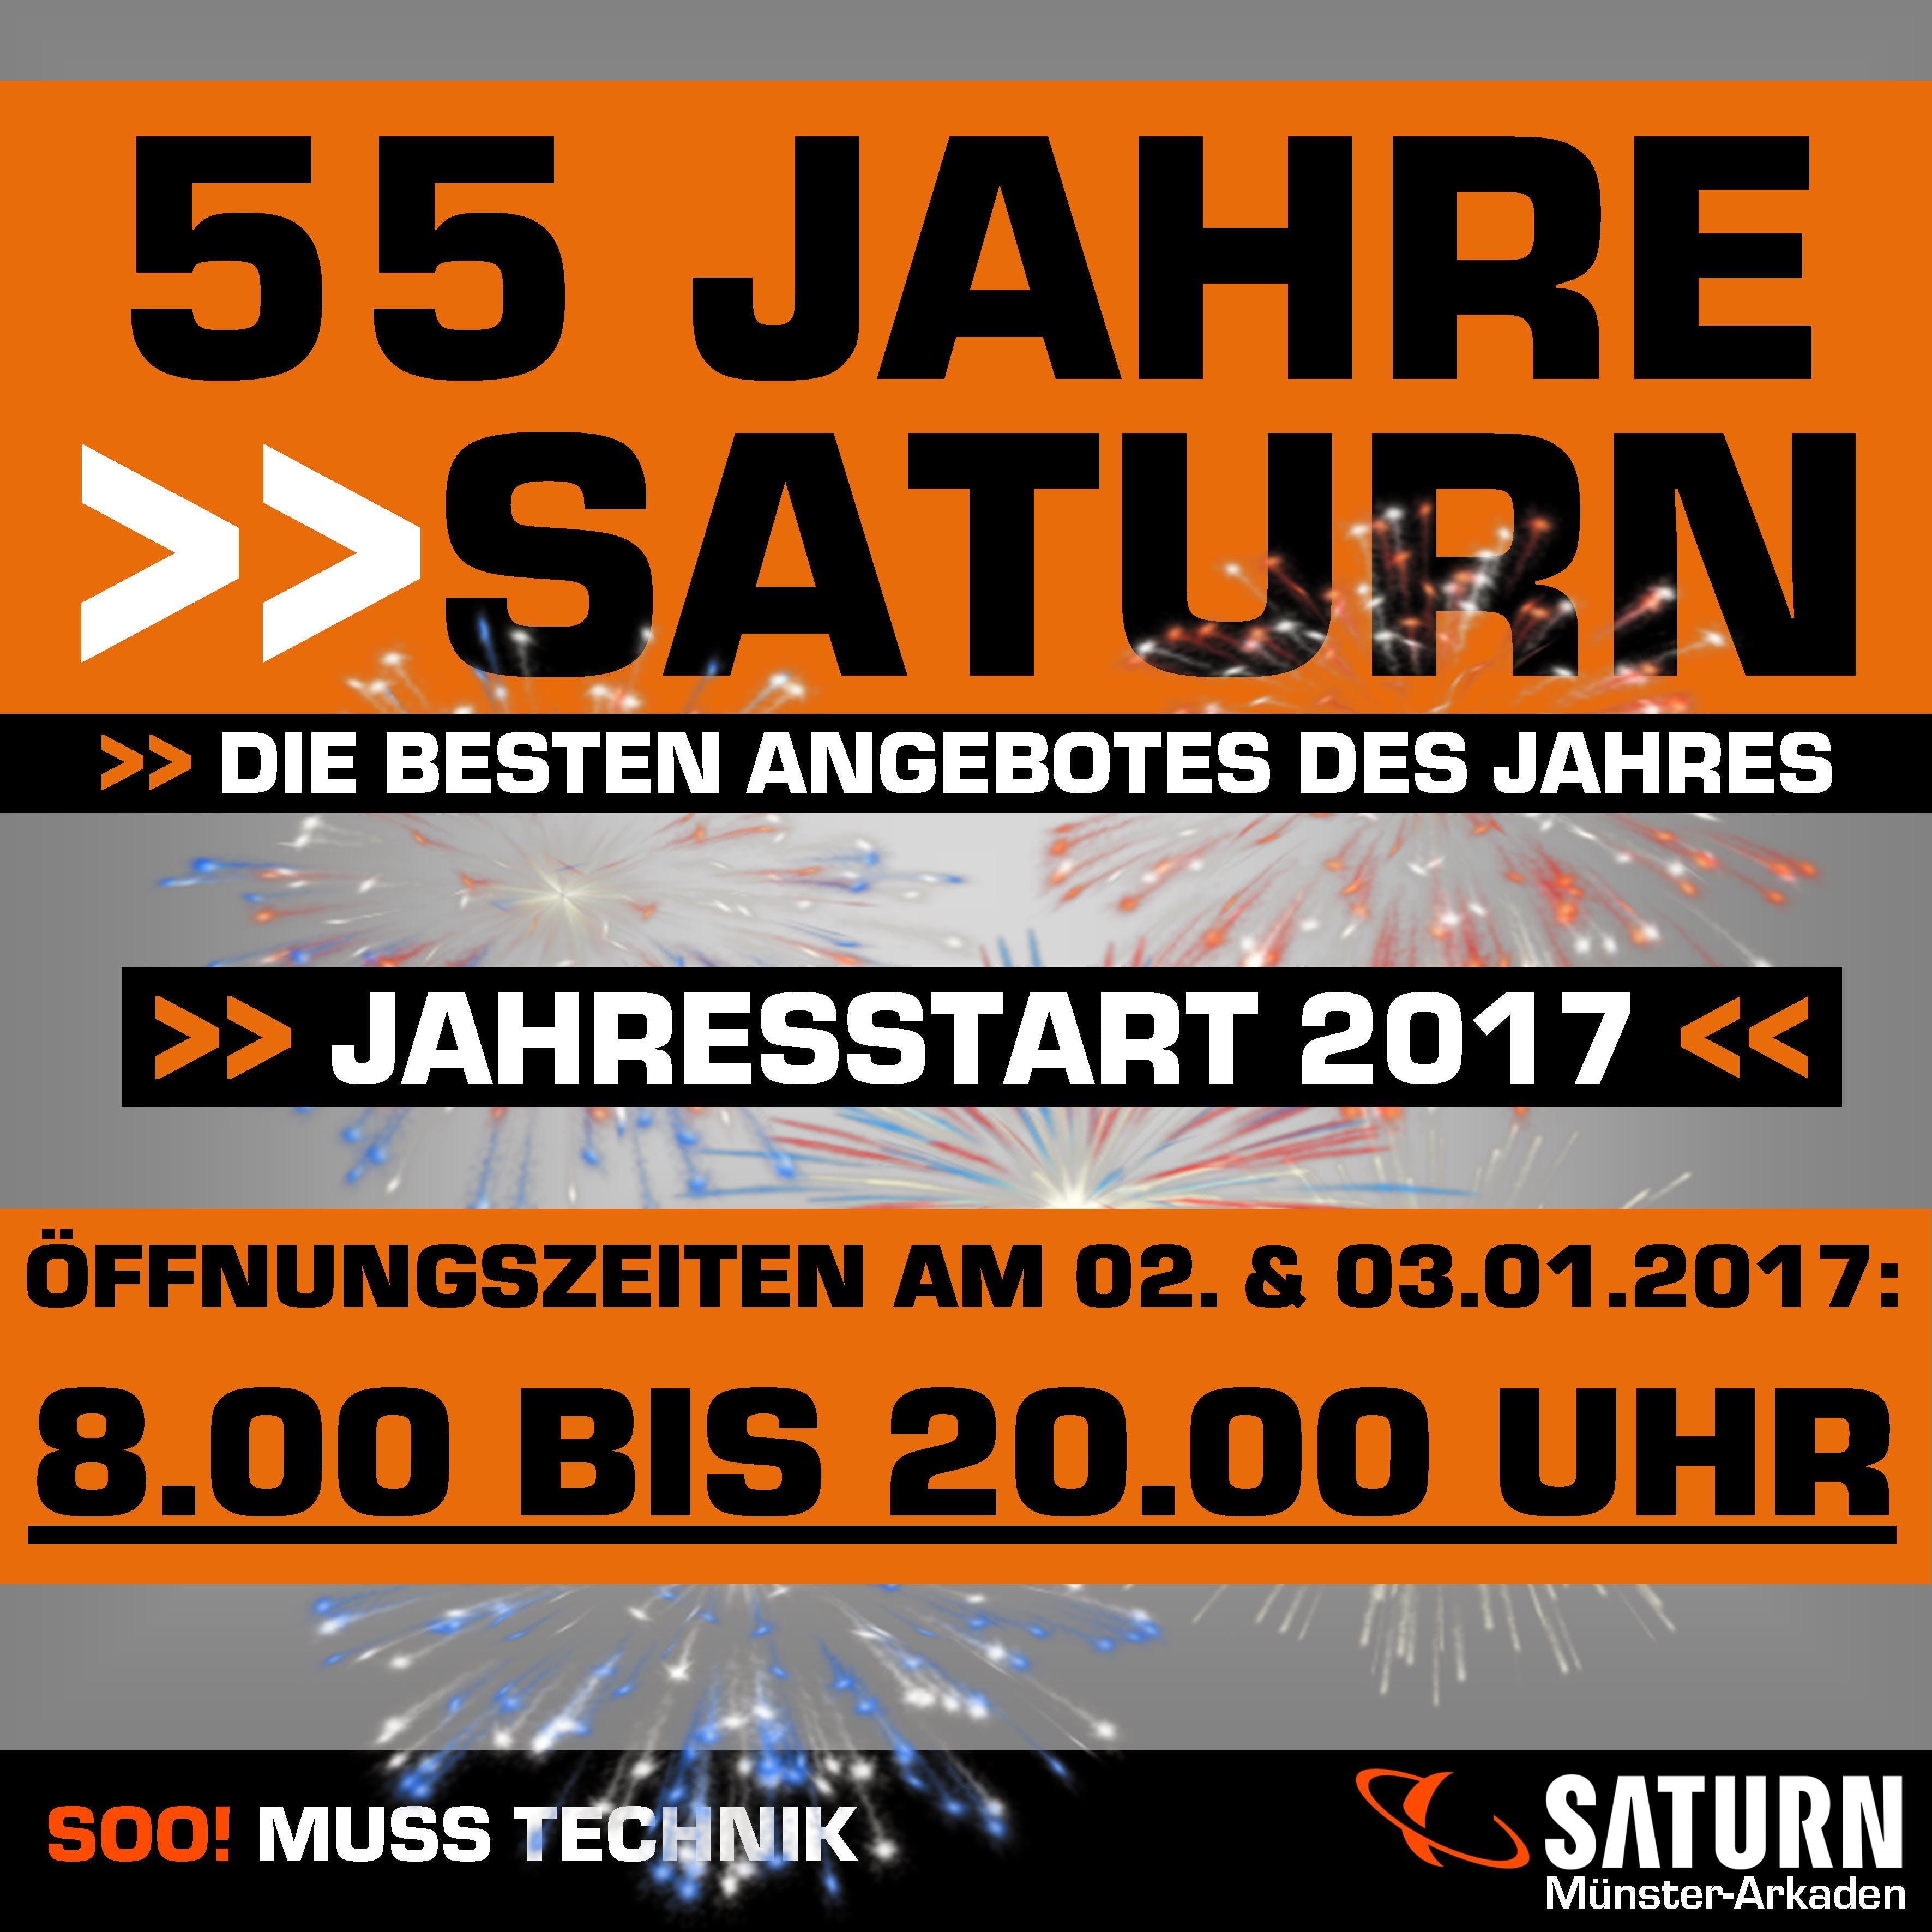 55 Jahre Saturn FB